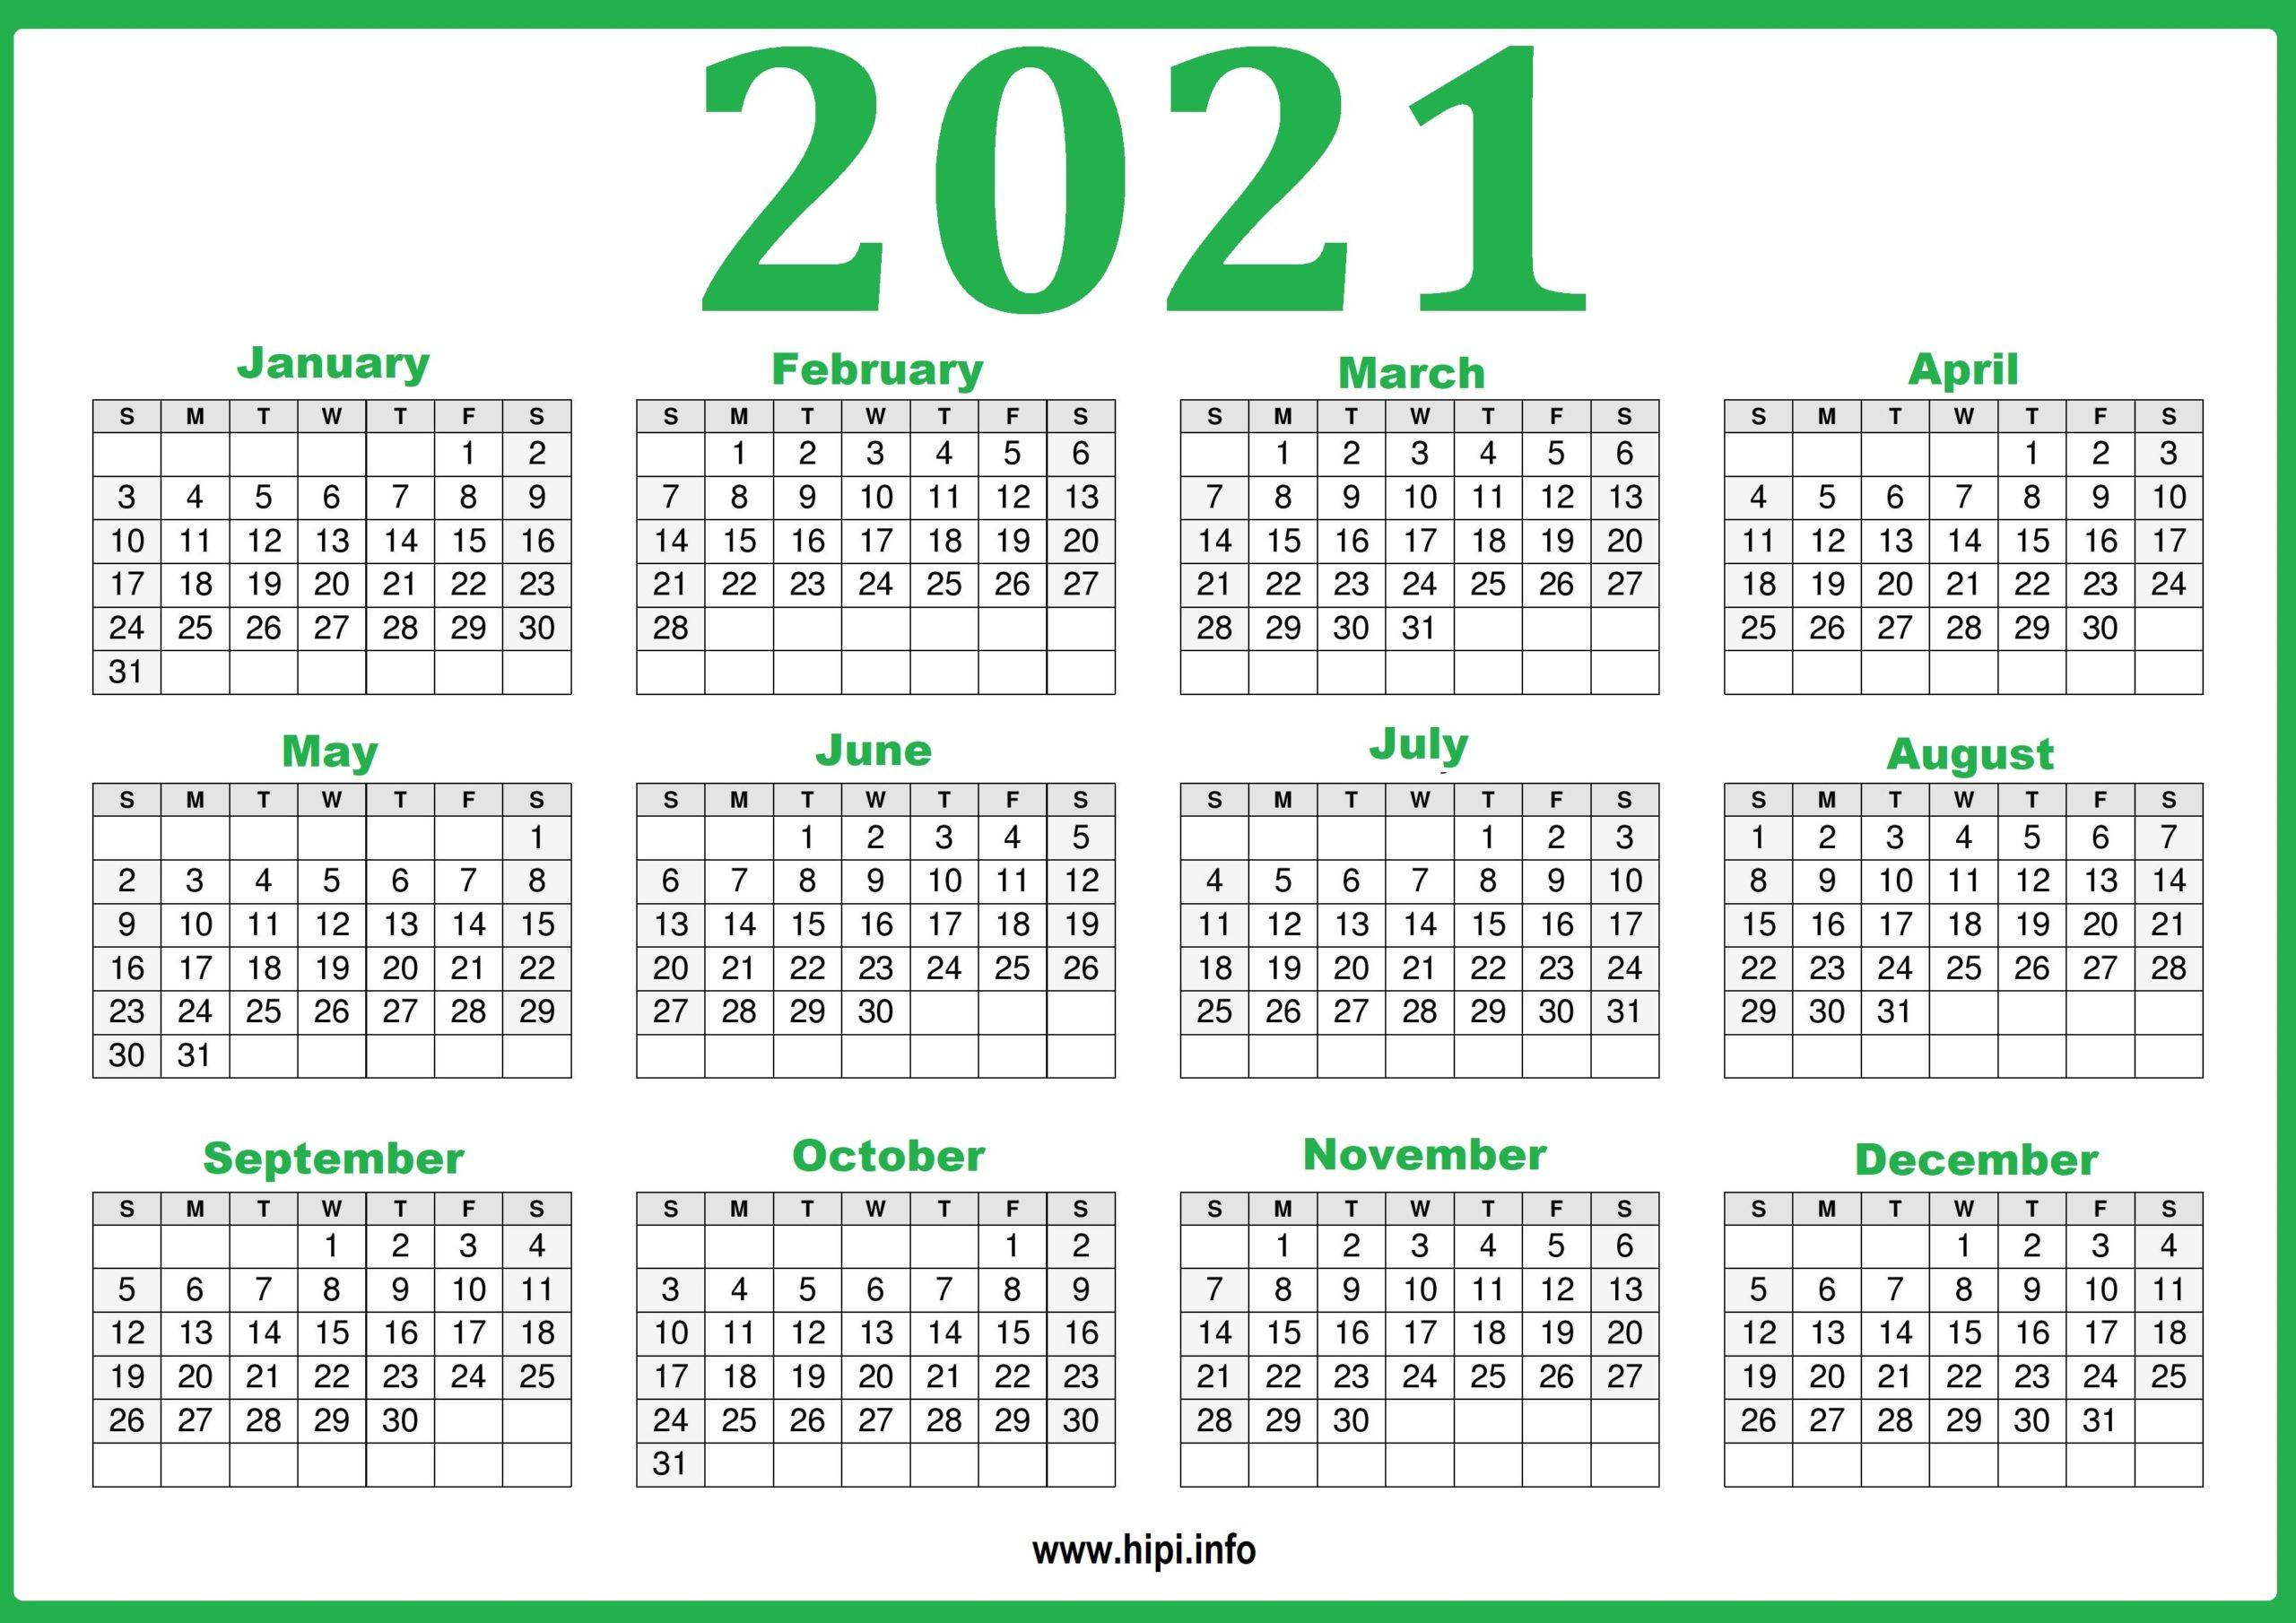 2021 Calendar Printable Yearly Template - Hipi  Free 2021 Calendar Printable